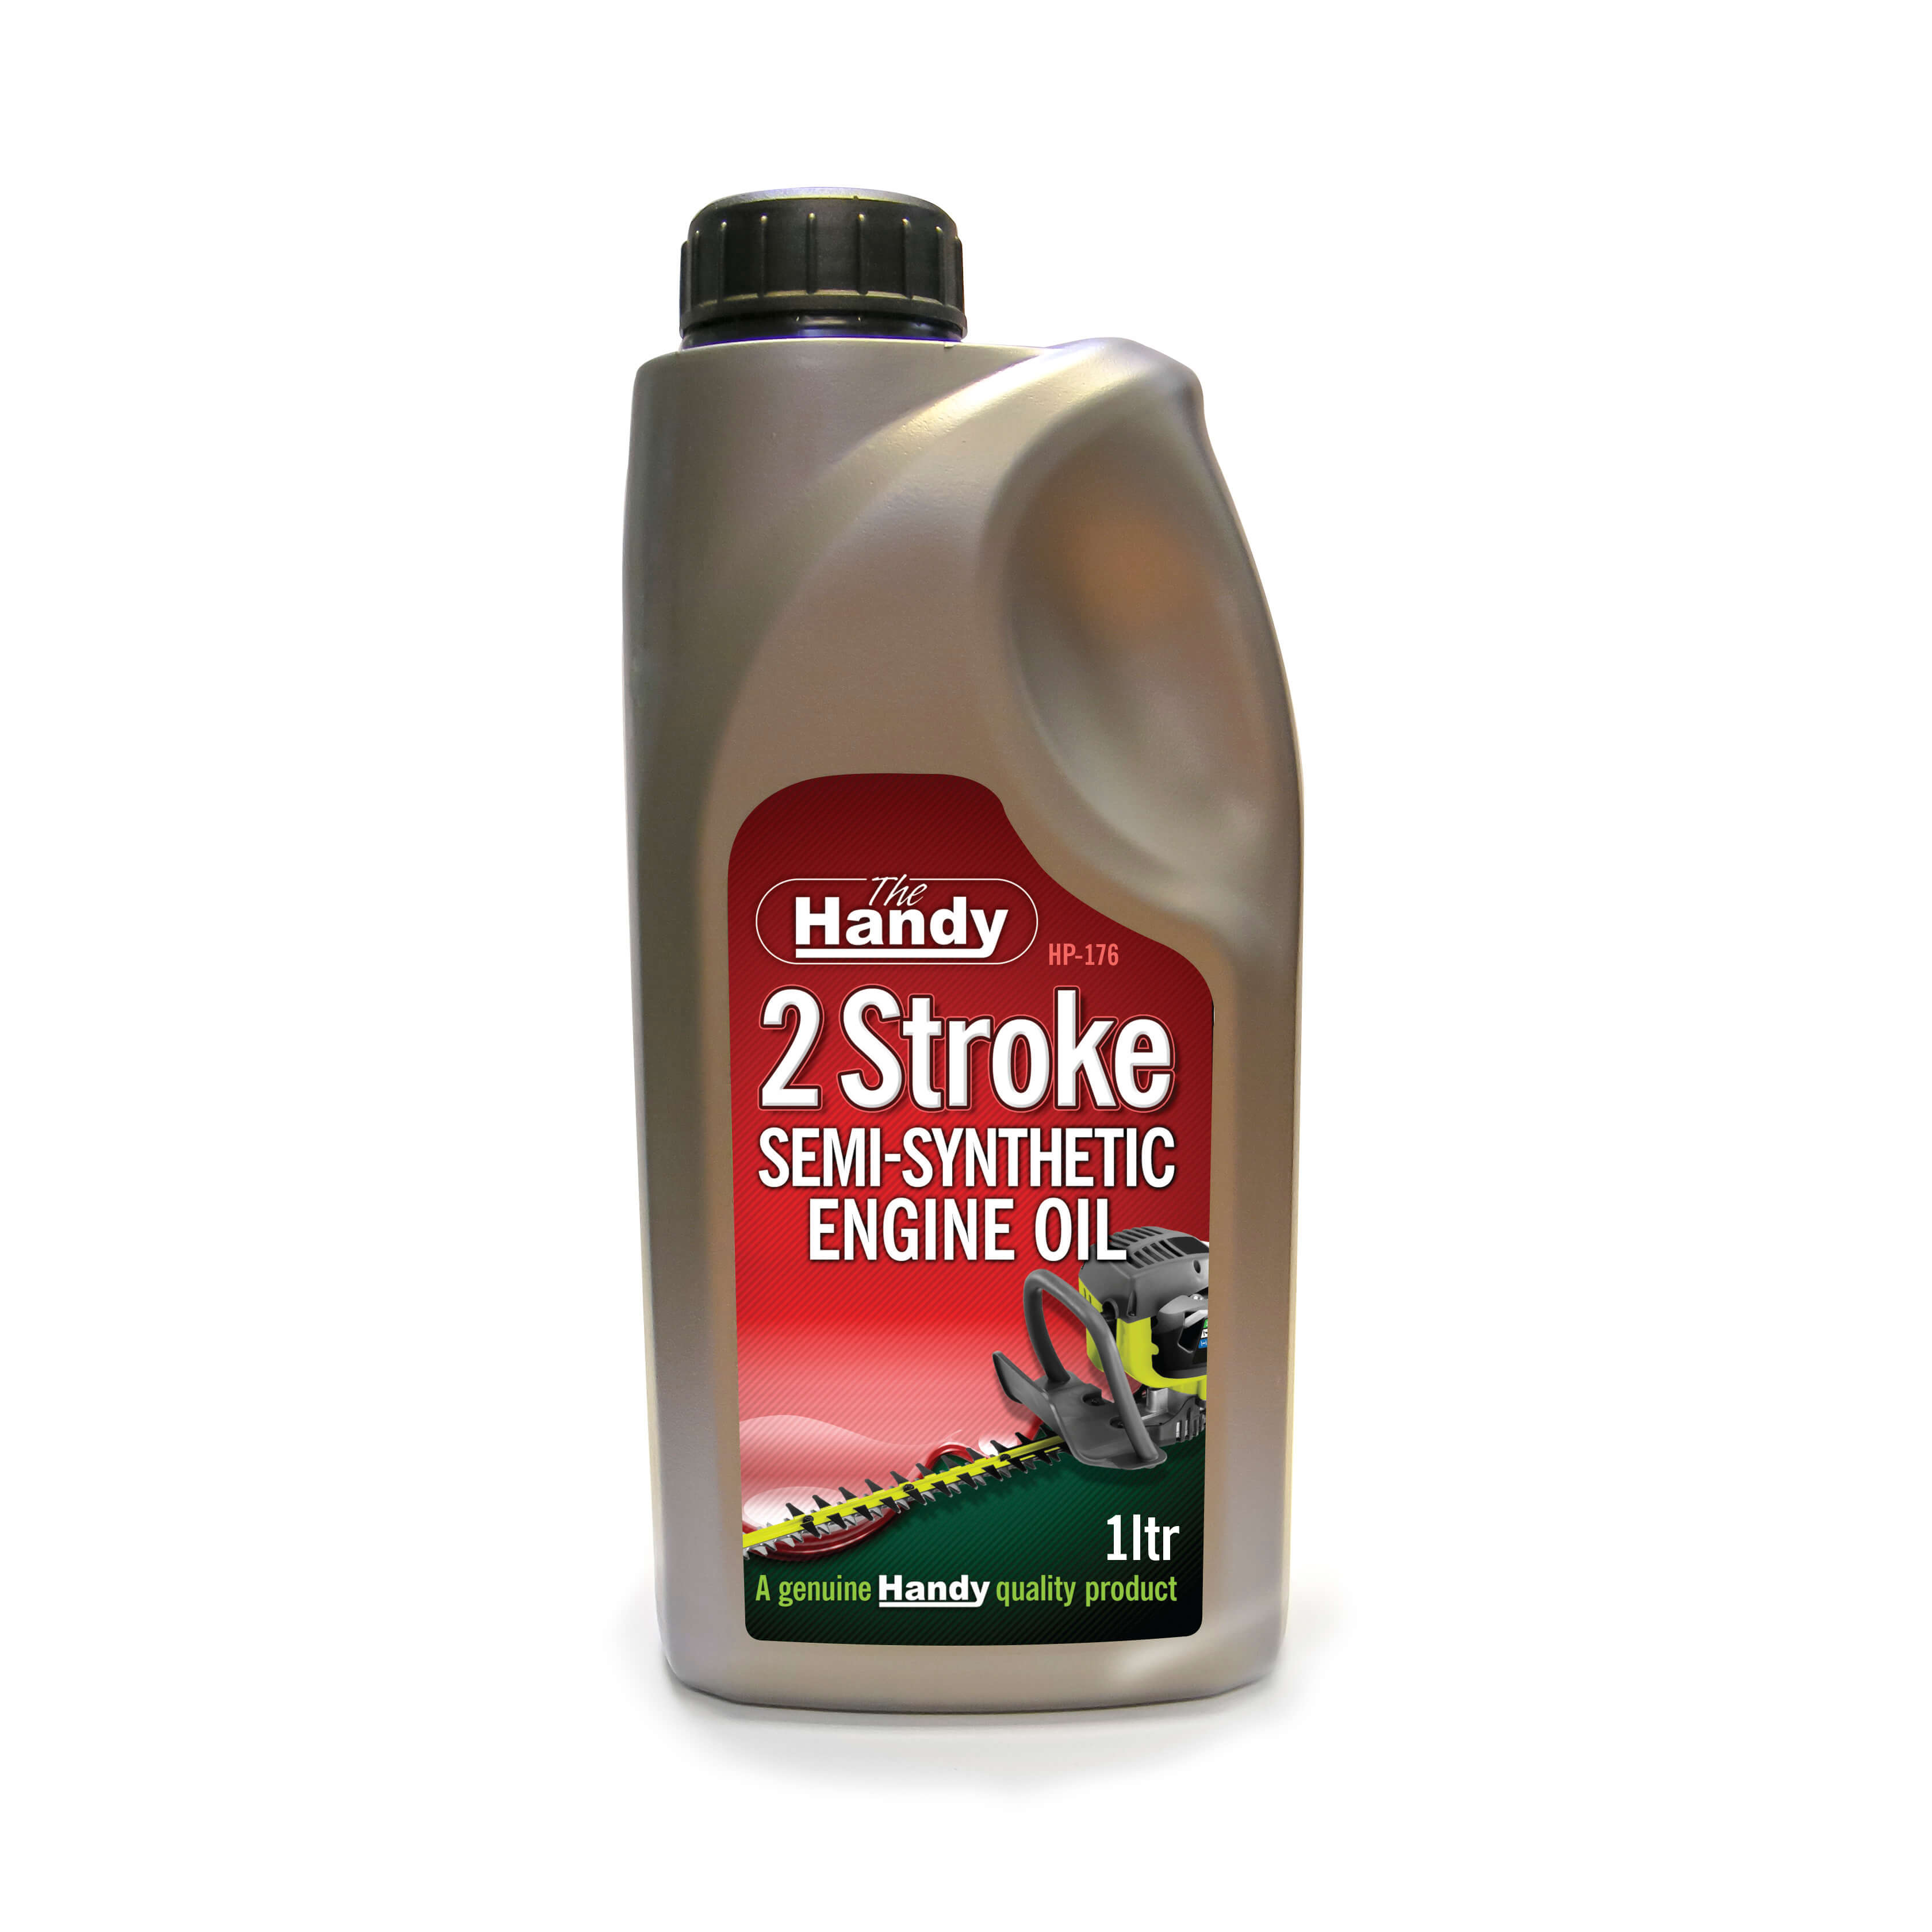 1 Ltr 2 Stroke S Synth Engine Oil Handy Garden Machinery